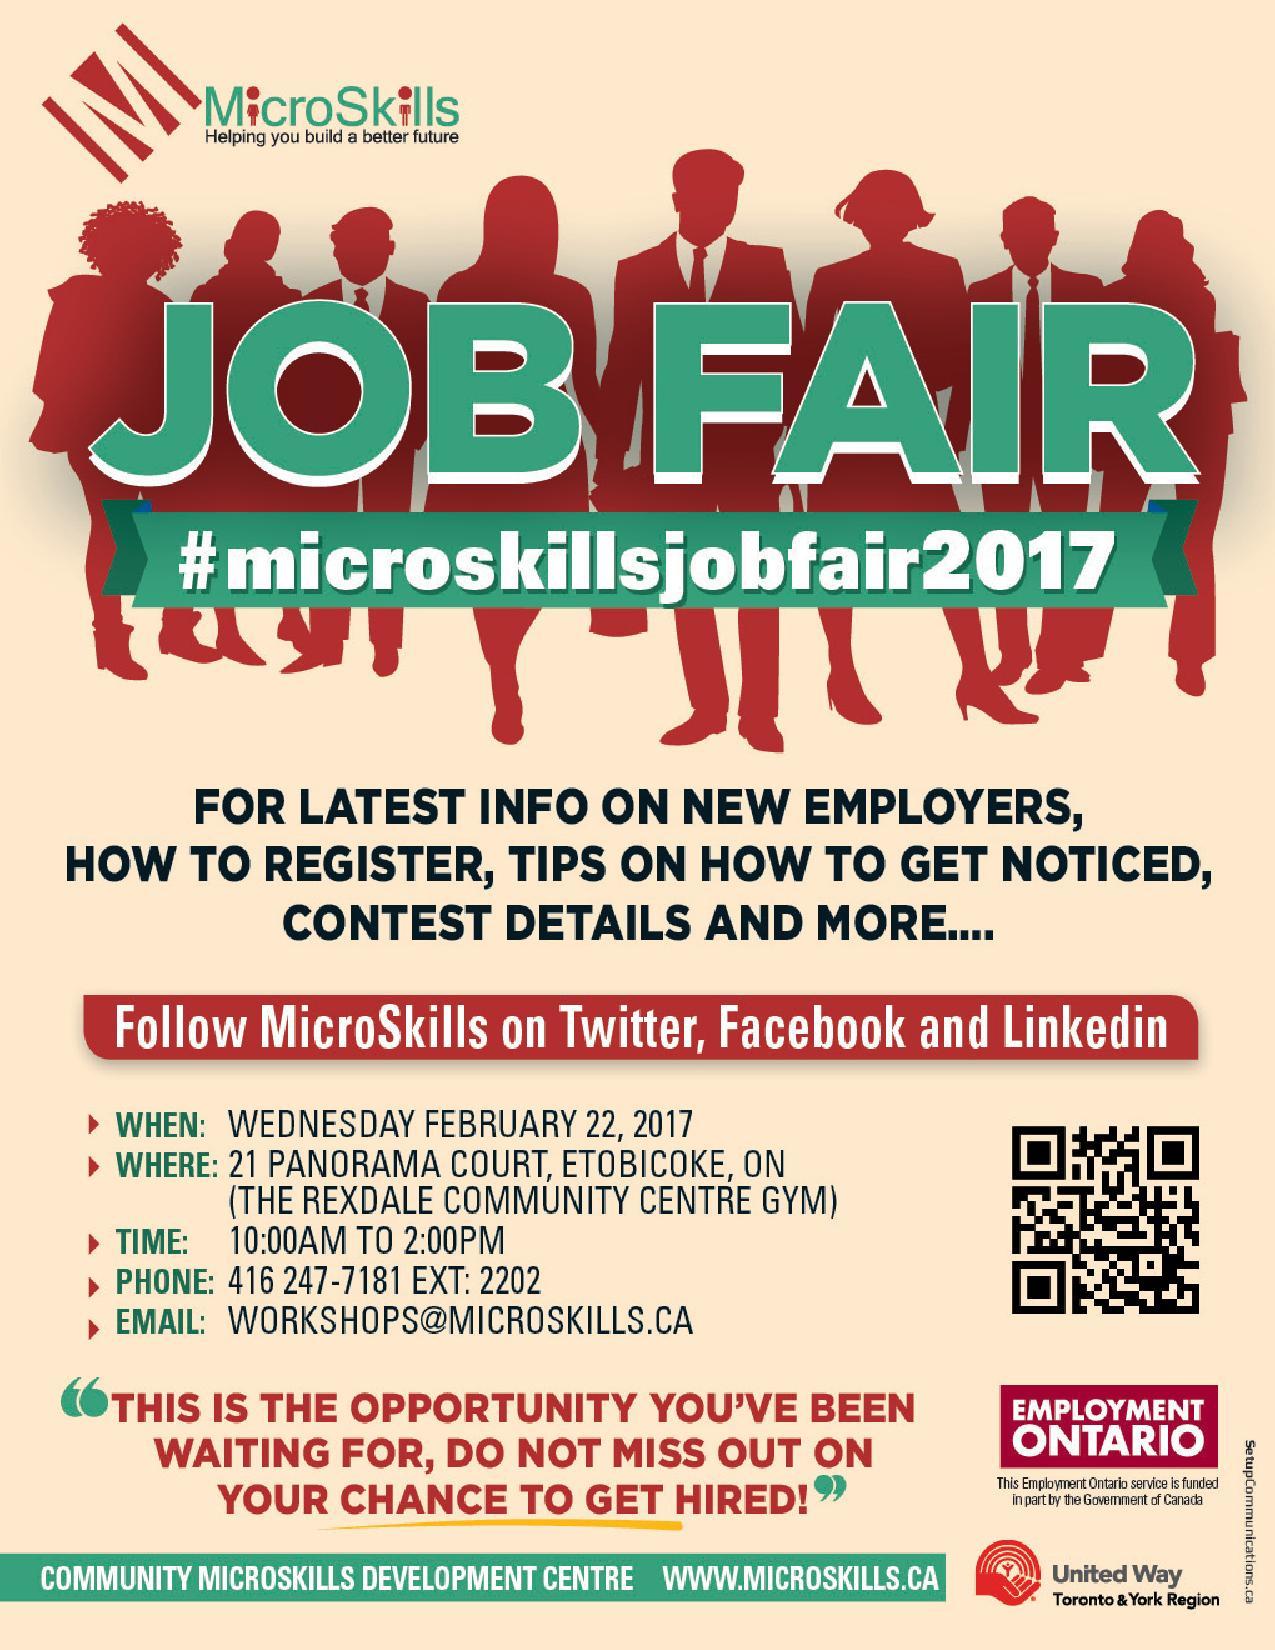 MicroSkills & Employment Ontario Job Fair Flyer